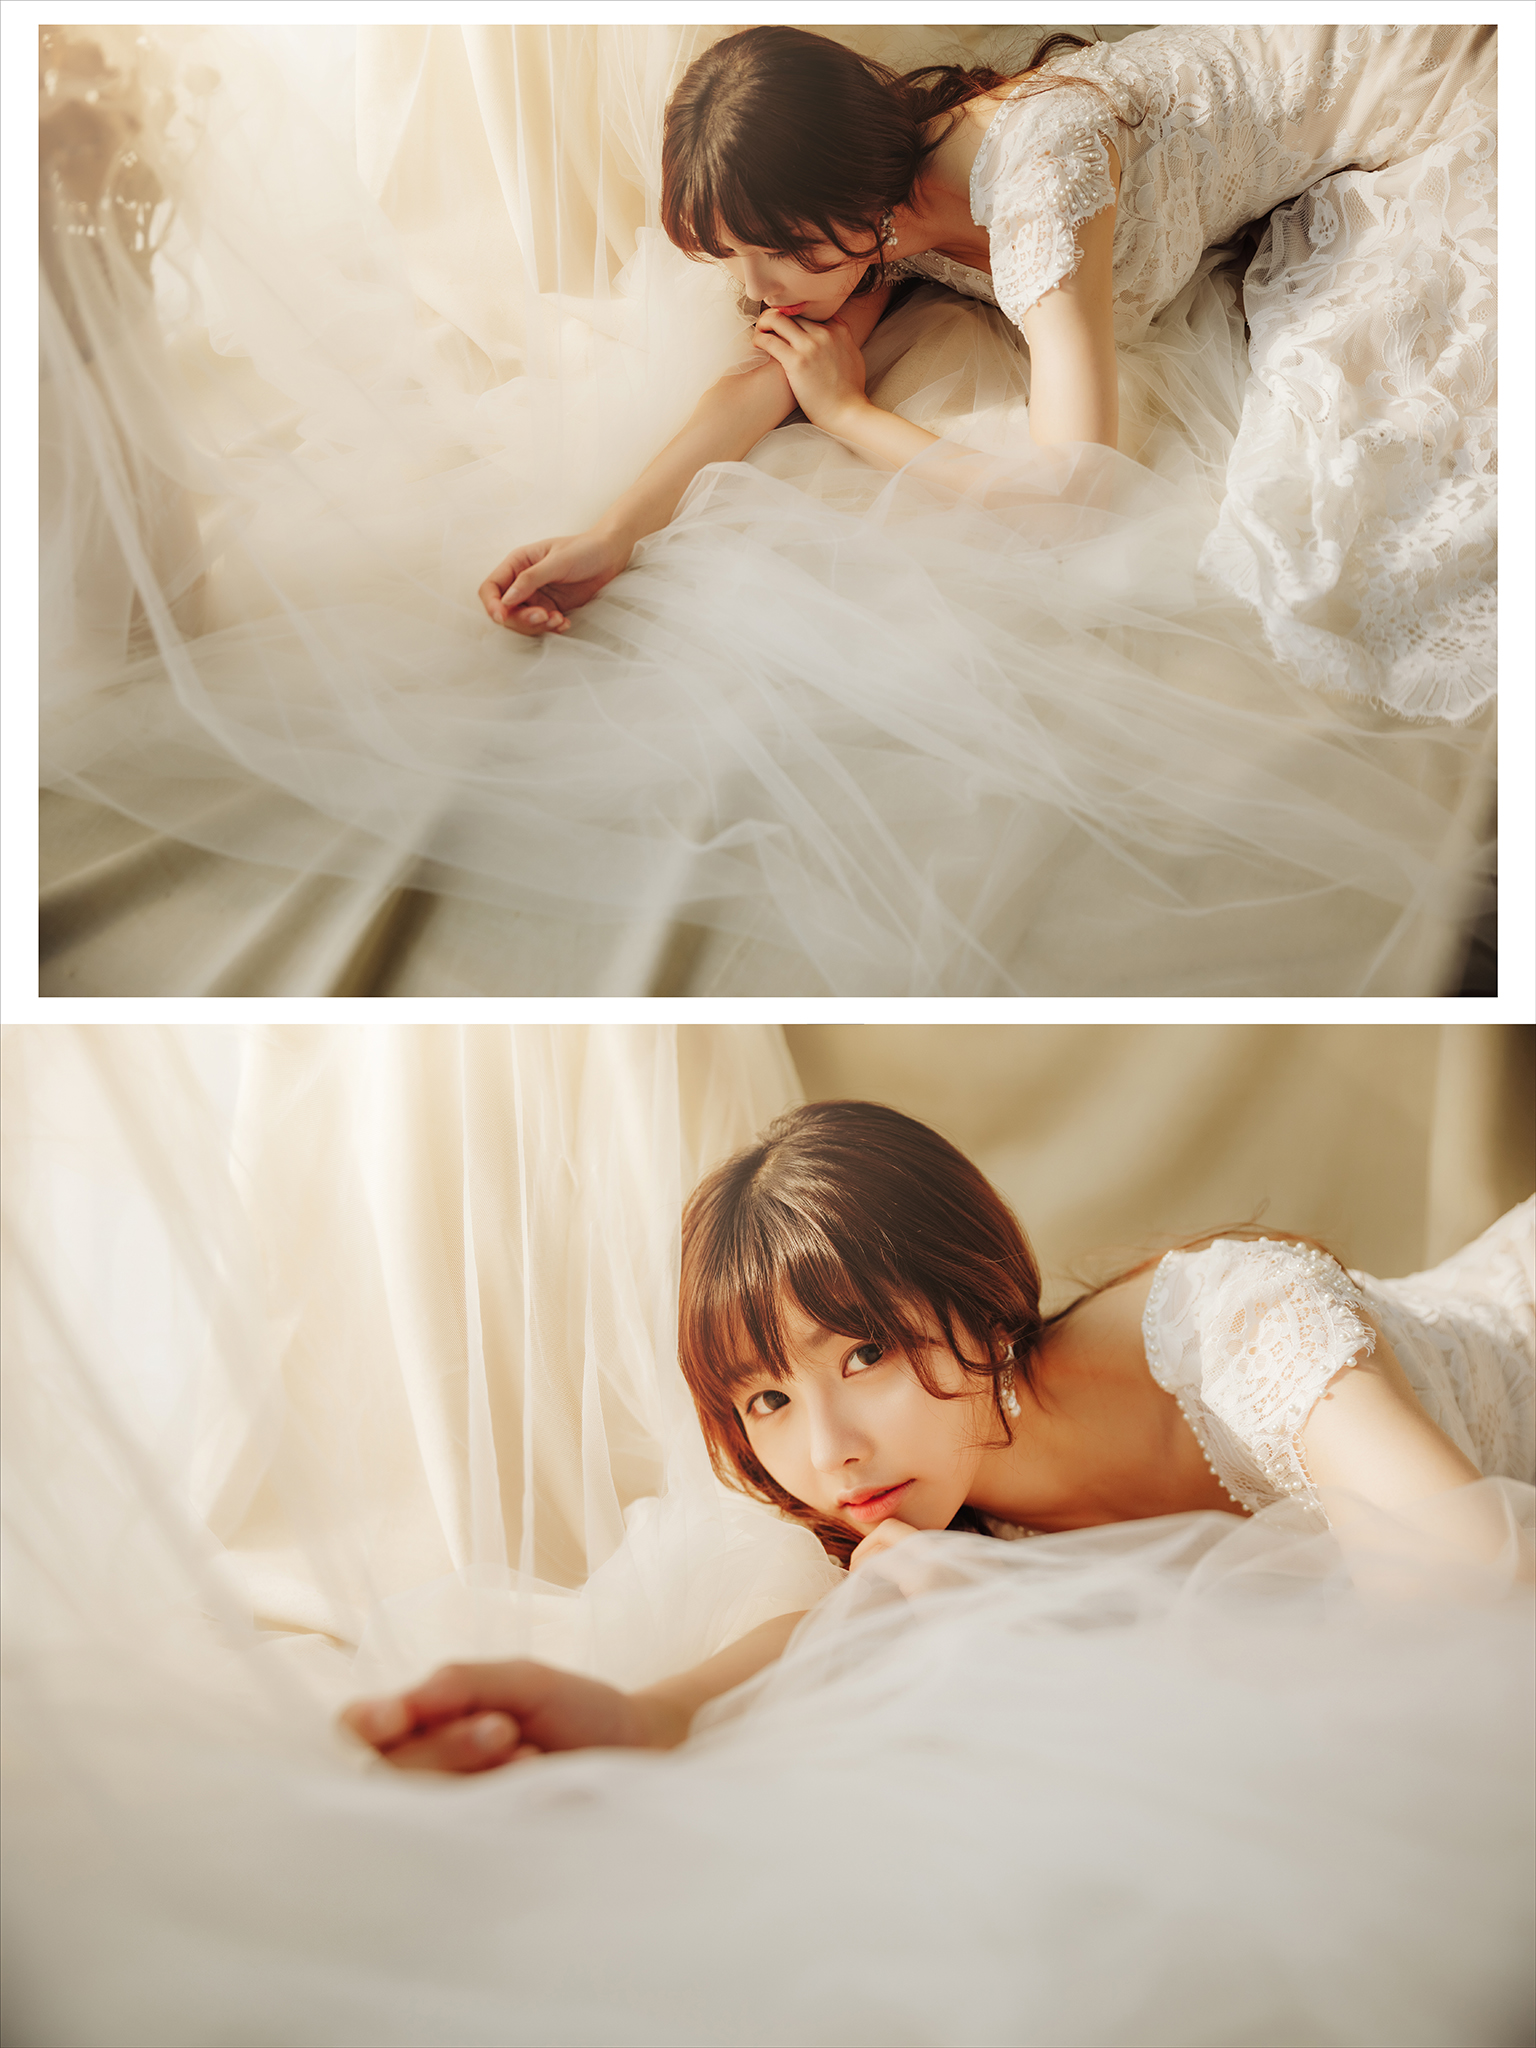 48956410053 166d137279 o - 【自主婚紗】+Yu+